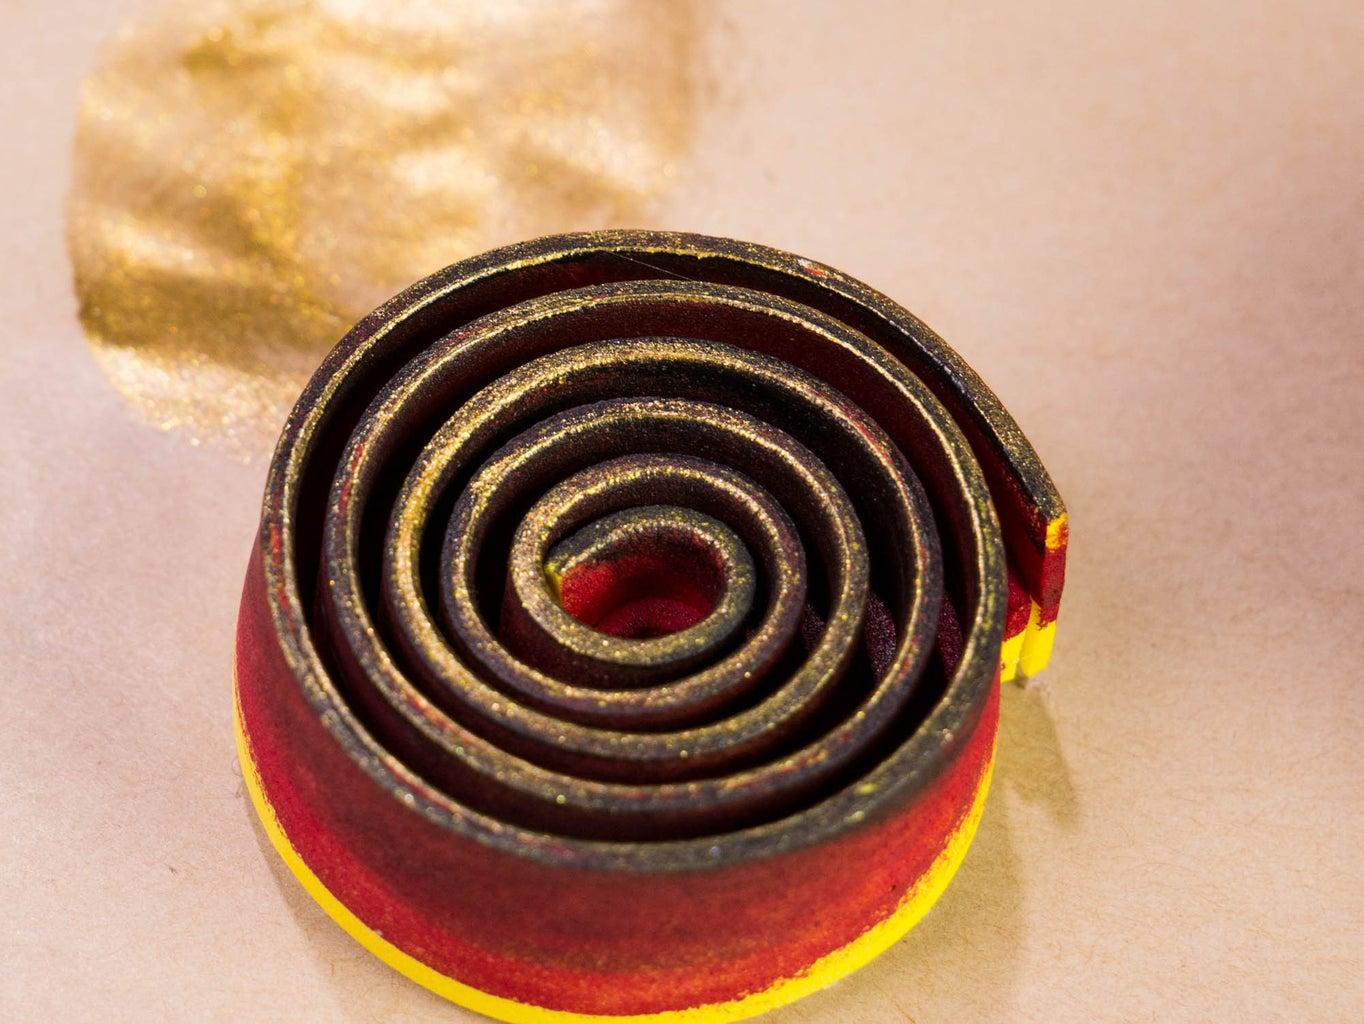 Make the Burner Coil